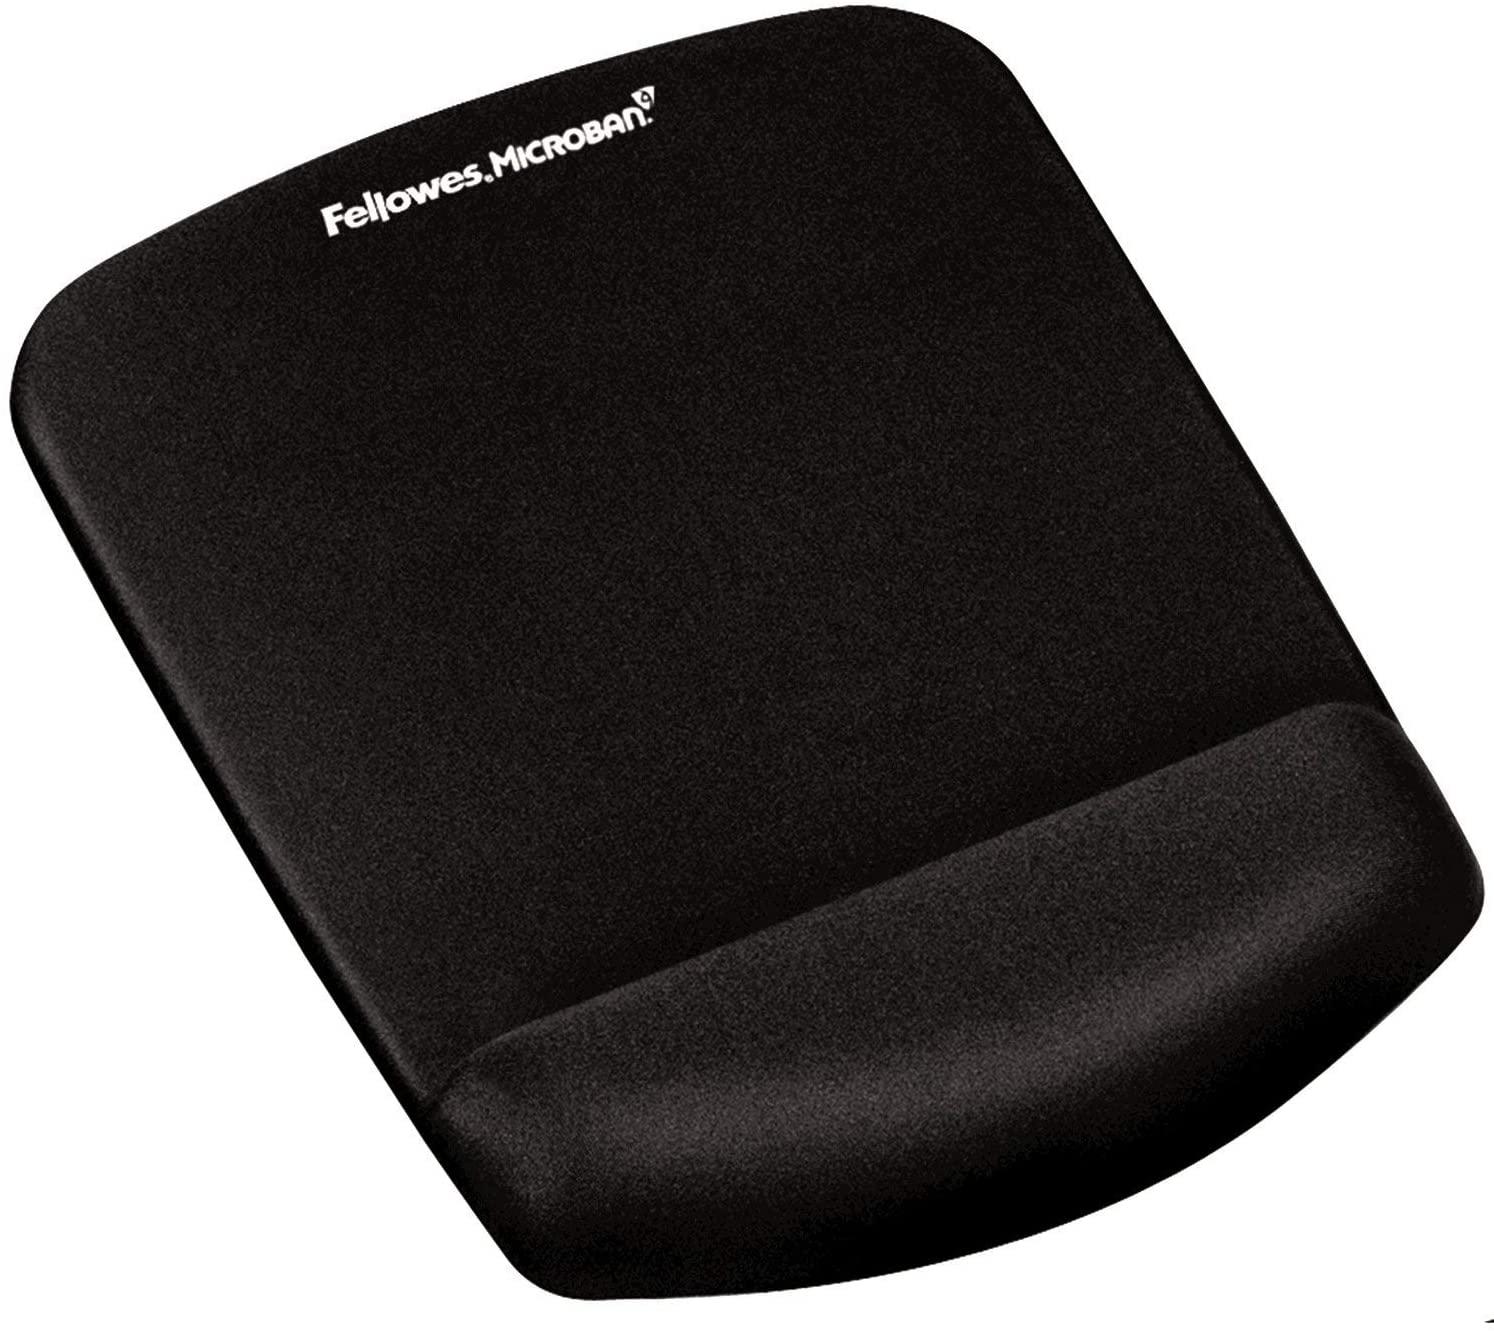 Fellowes PlushTouch Mouse Mat